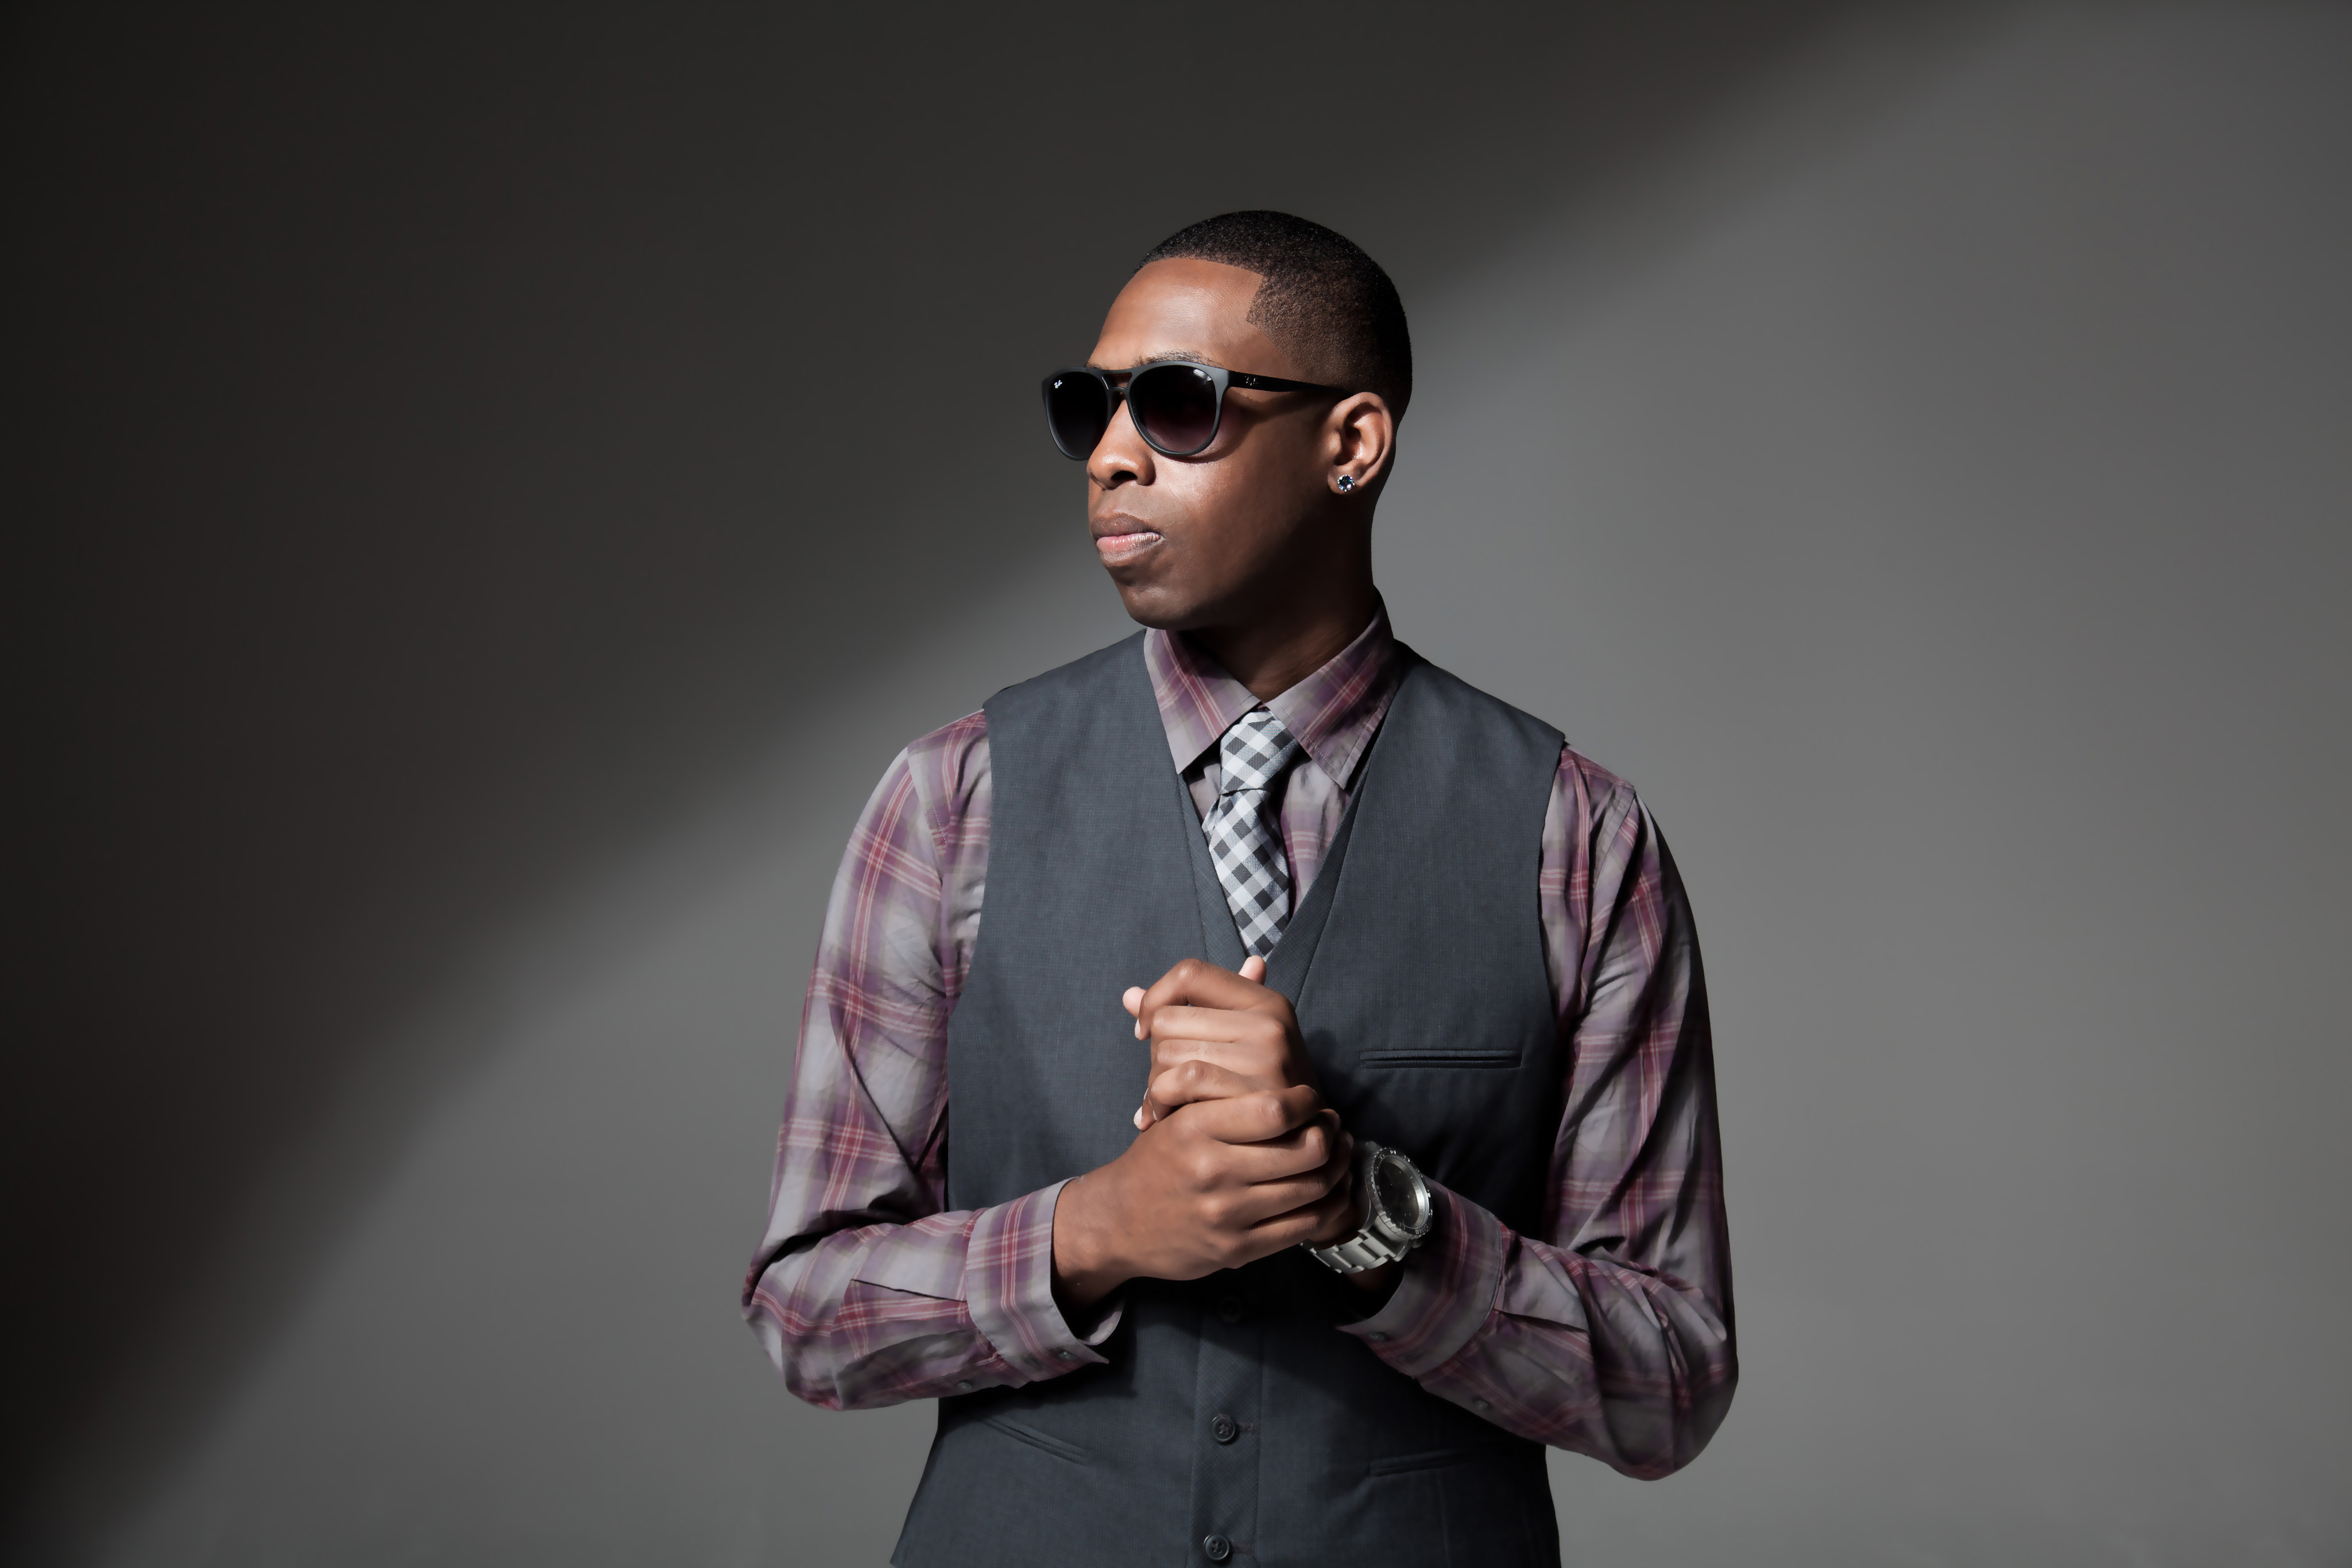 Silkk The Shocker Says His Rap Flow Was 'Counterclockwise